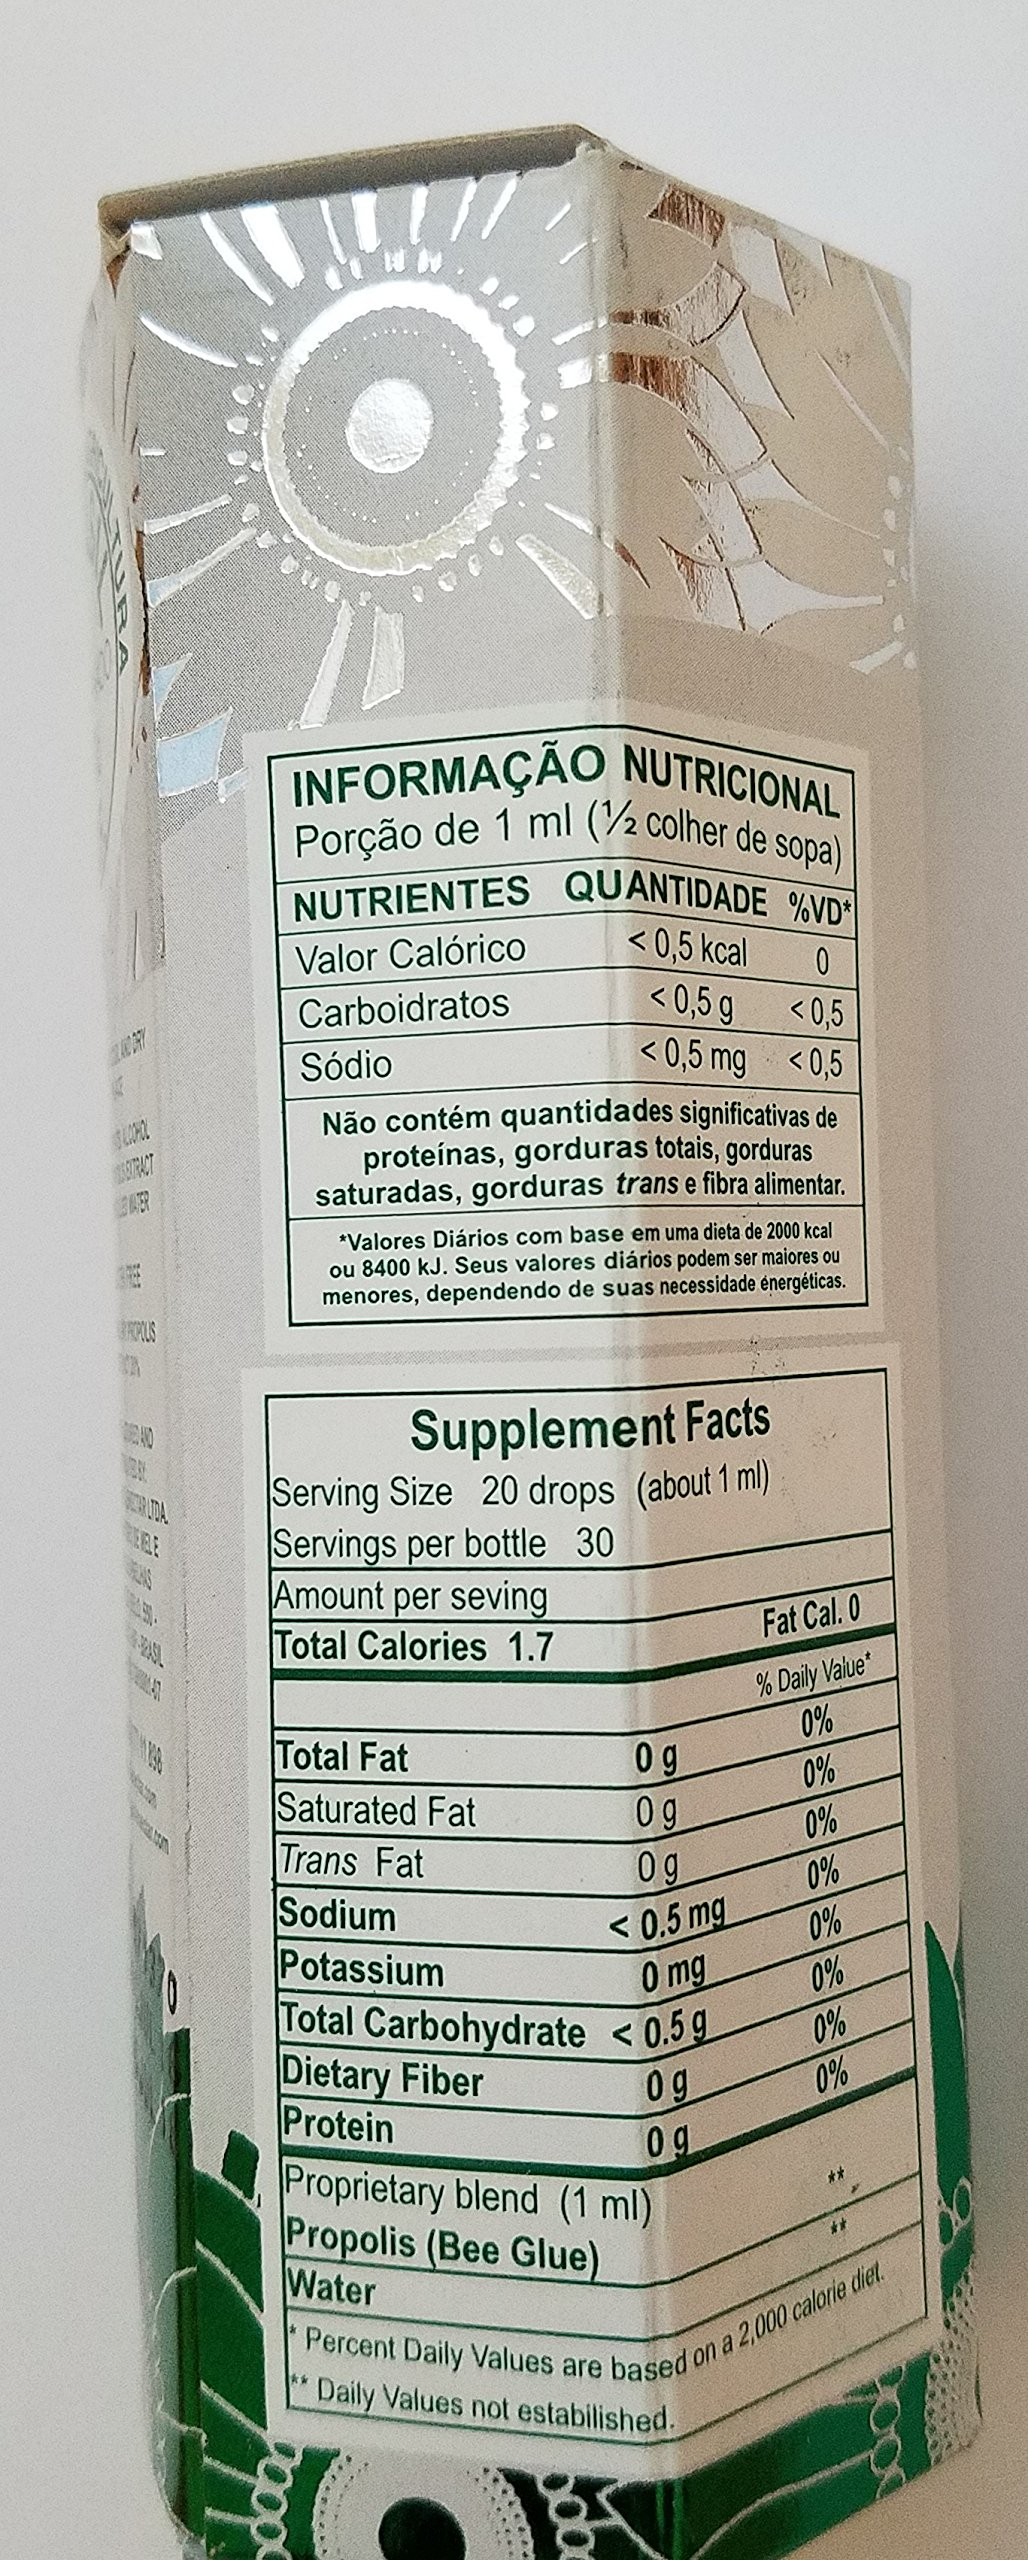 Polenectar 10 Bottles Green Propolis Crystal - Aqueous Solution Extract 30ML by Polenectar (Image #2)